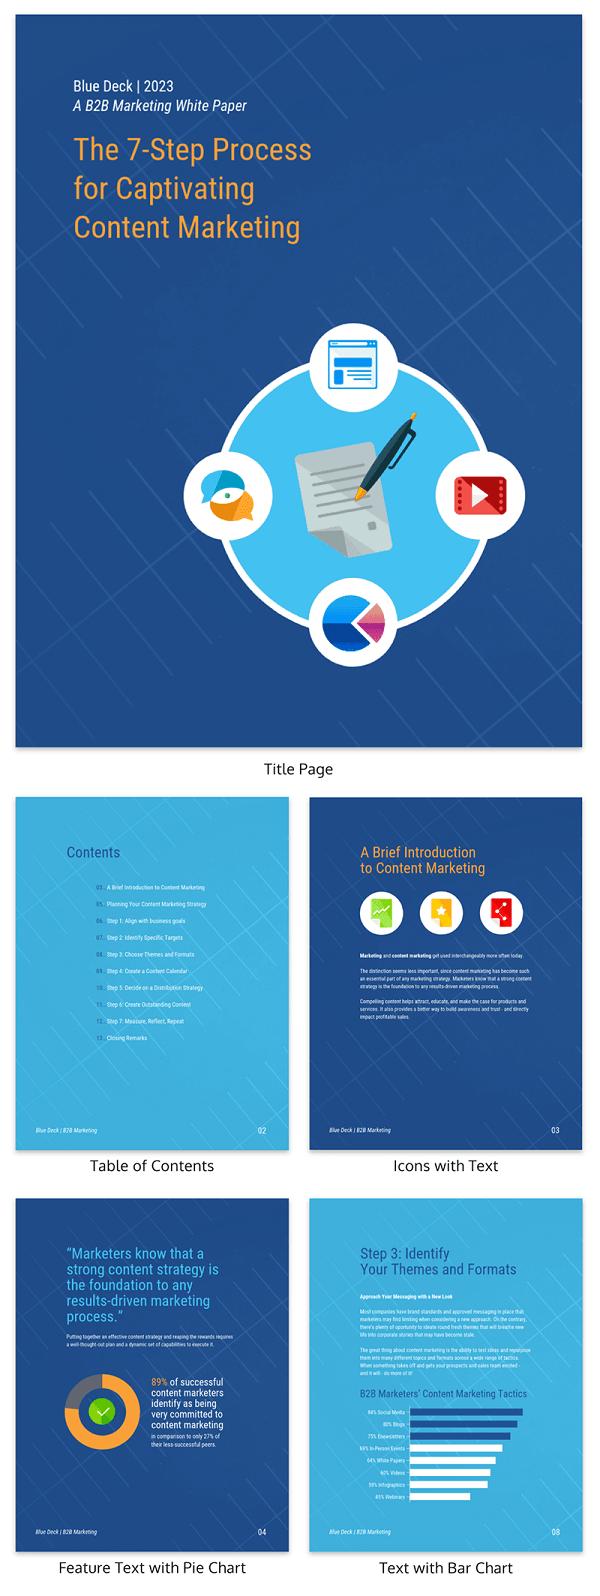 B2B Content Marketing White Paper Template